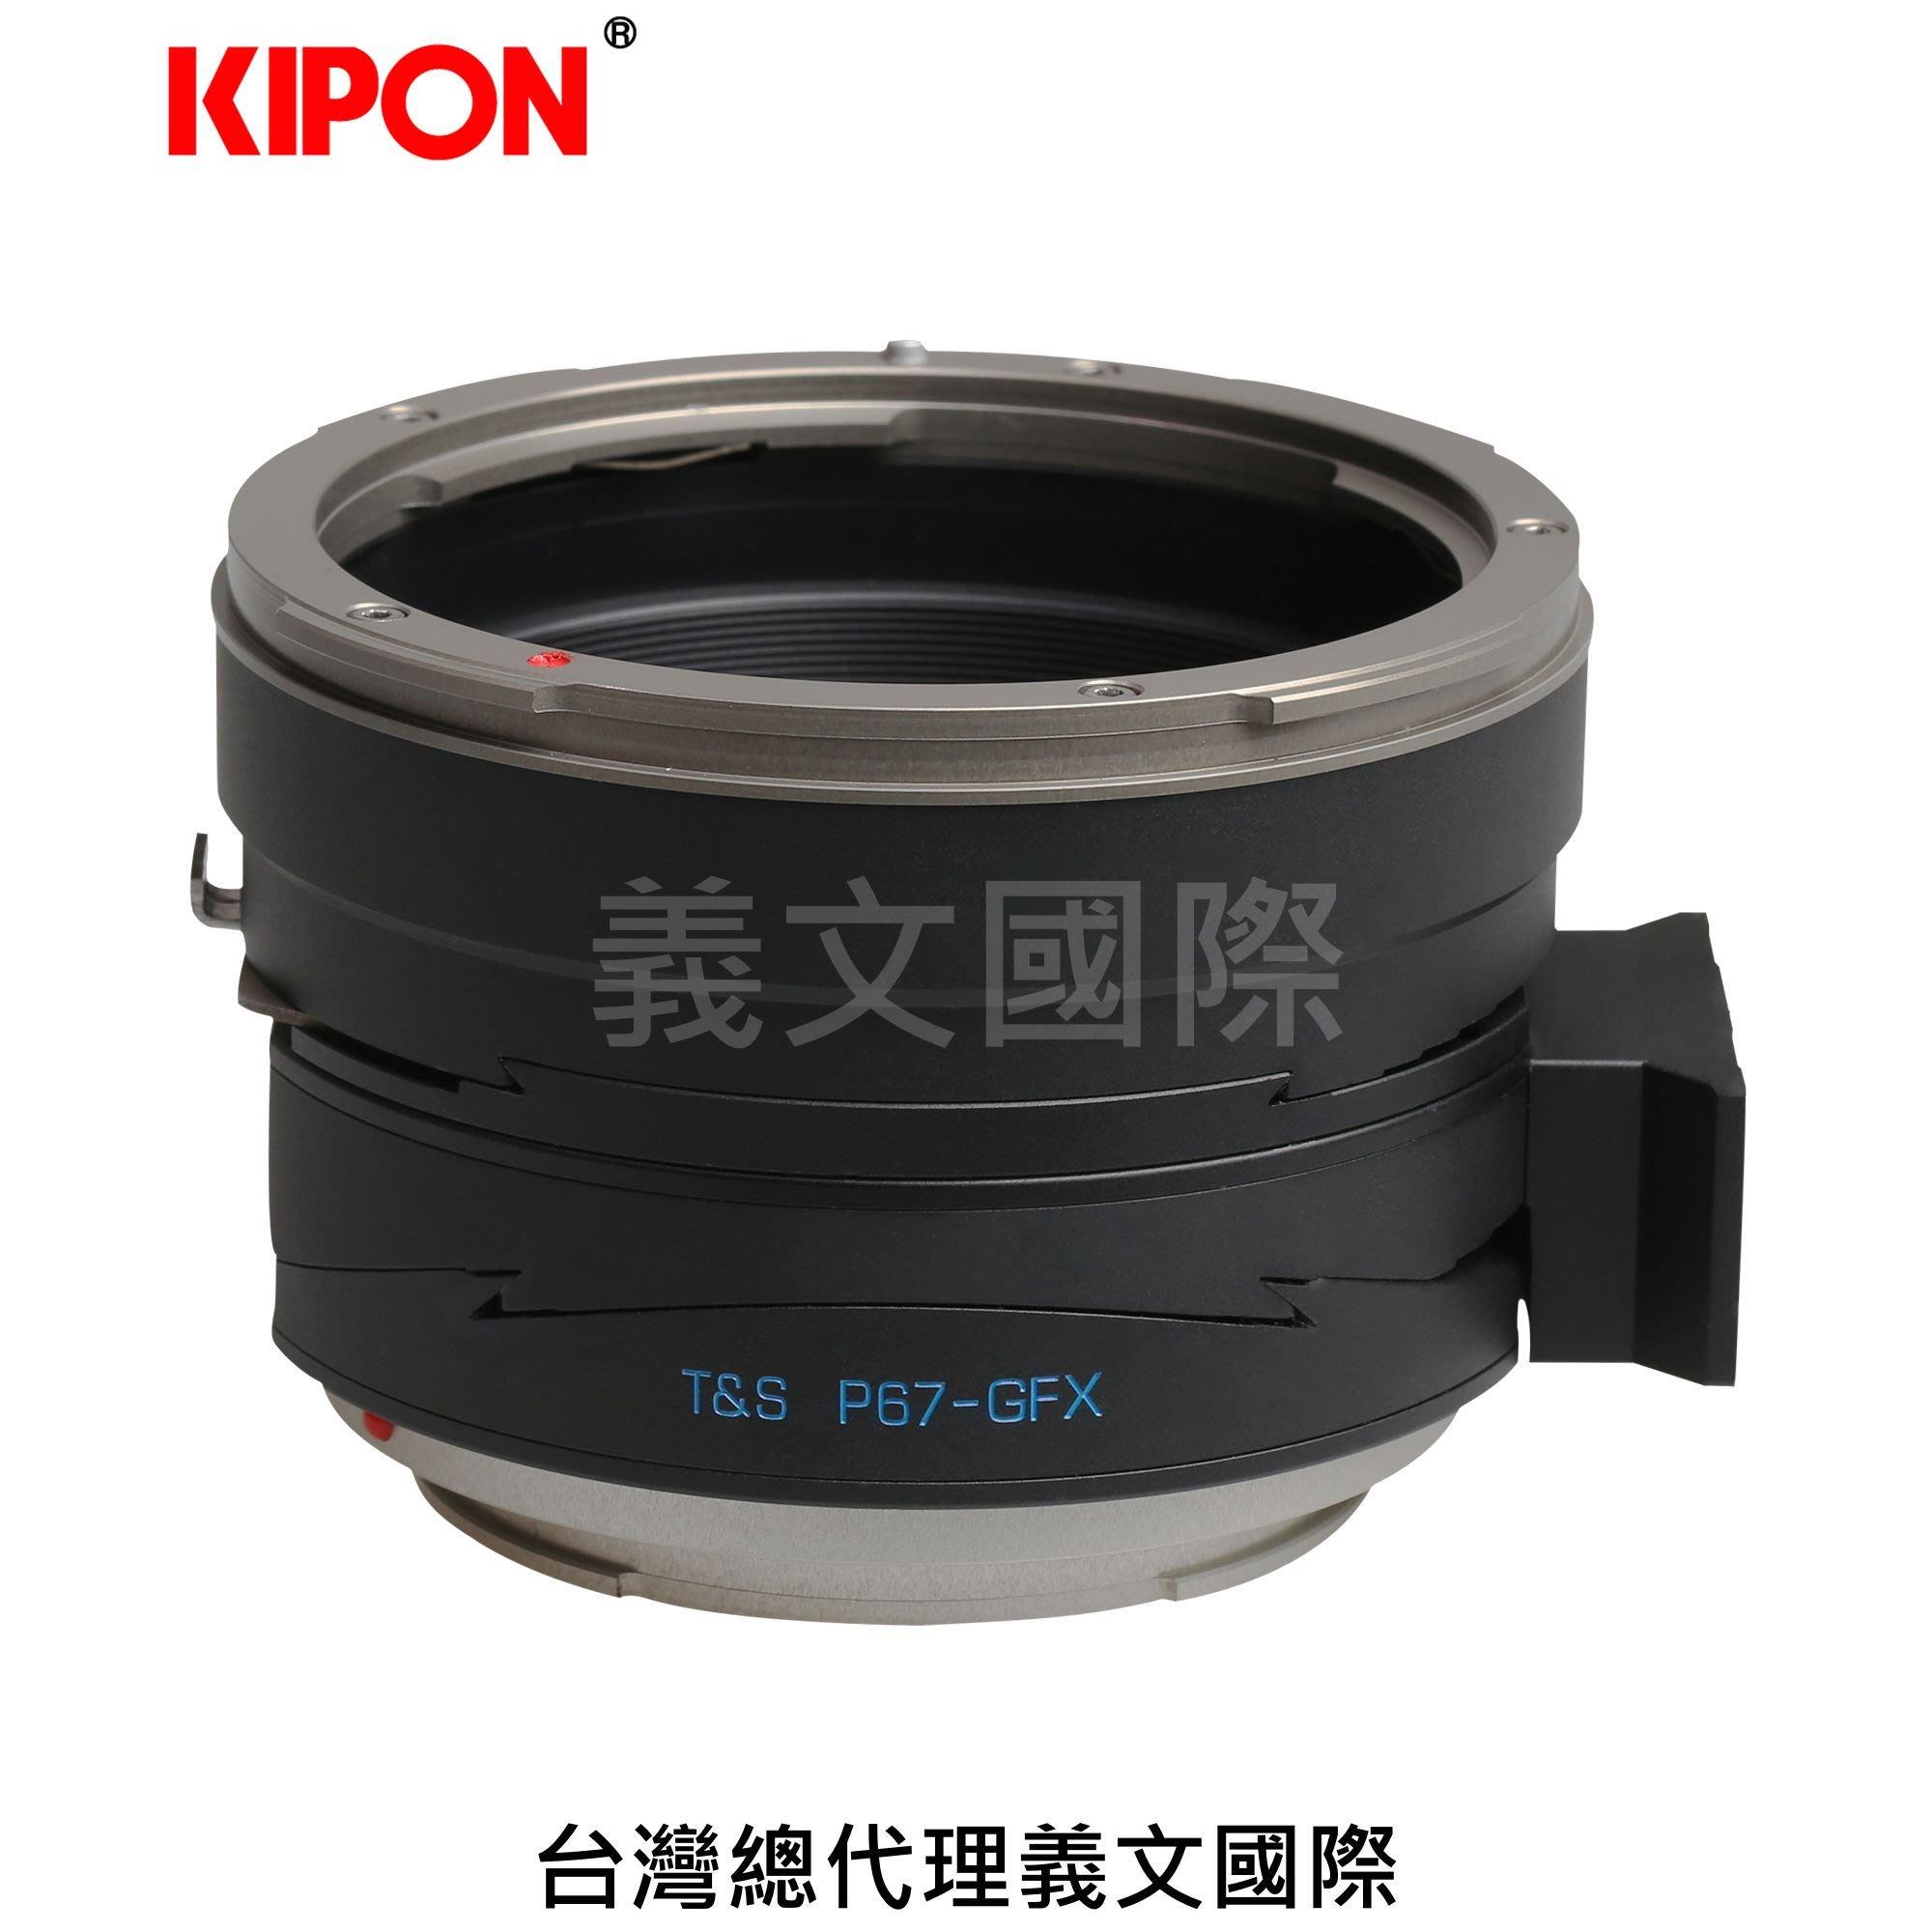 Kipon轉接環專賣店:PRO T&S PENTAX67-GFX(Fuji 富士 GFX-100 GFX-50S GFX-50R)